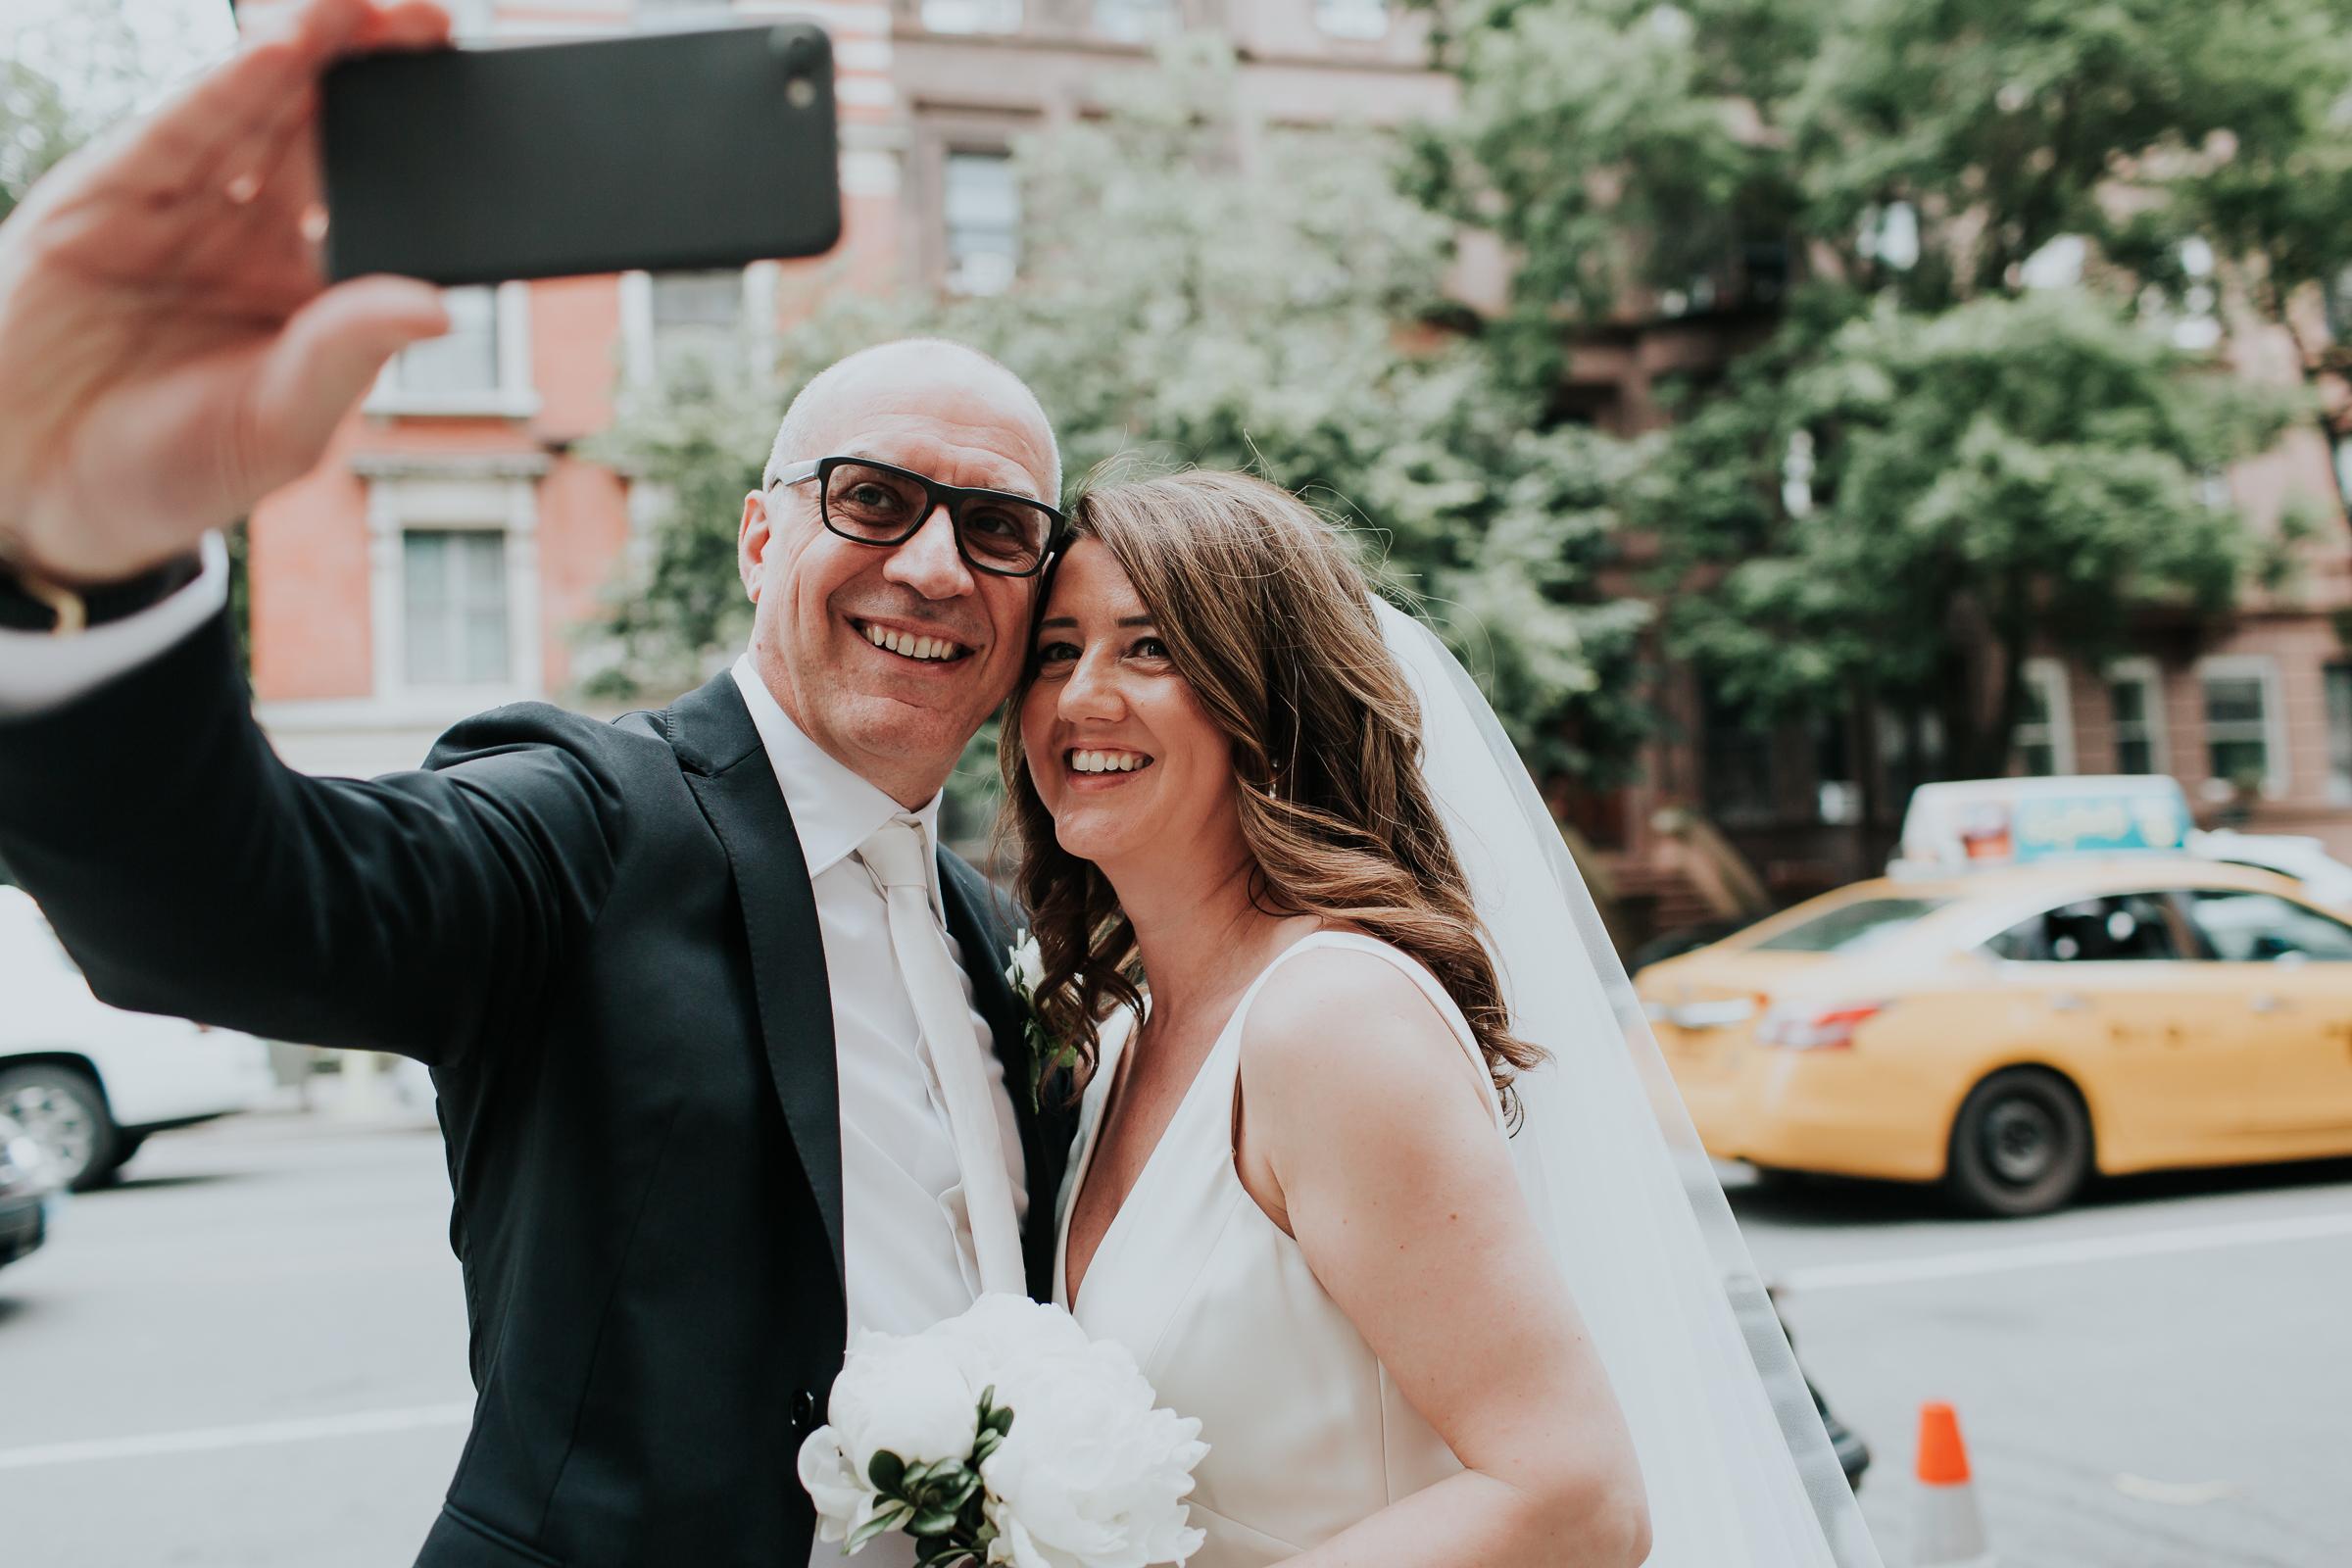 Robert-NYC-Museum-Of-Arts-&-Design-Greek-Italian-New-York-Documentary-Wedding-Photographer-36.jpg